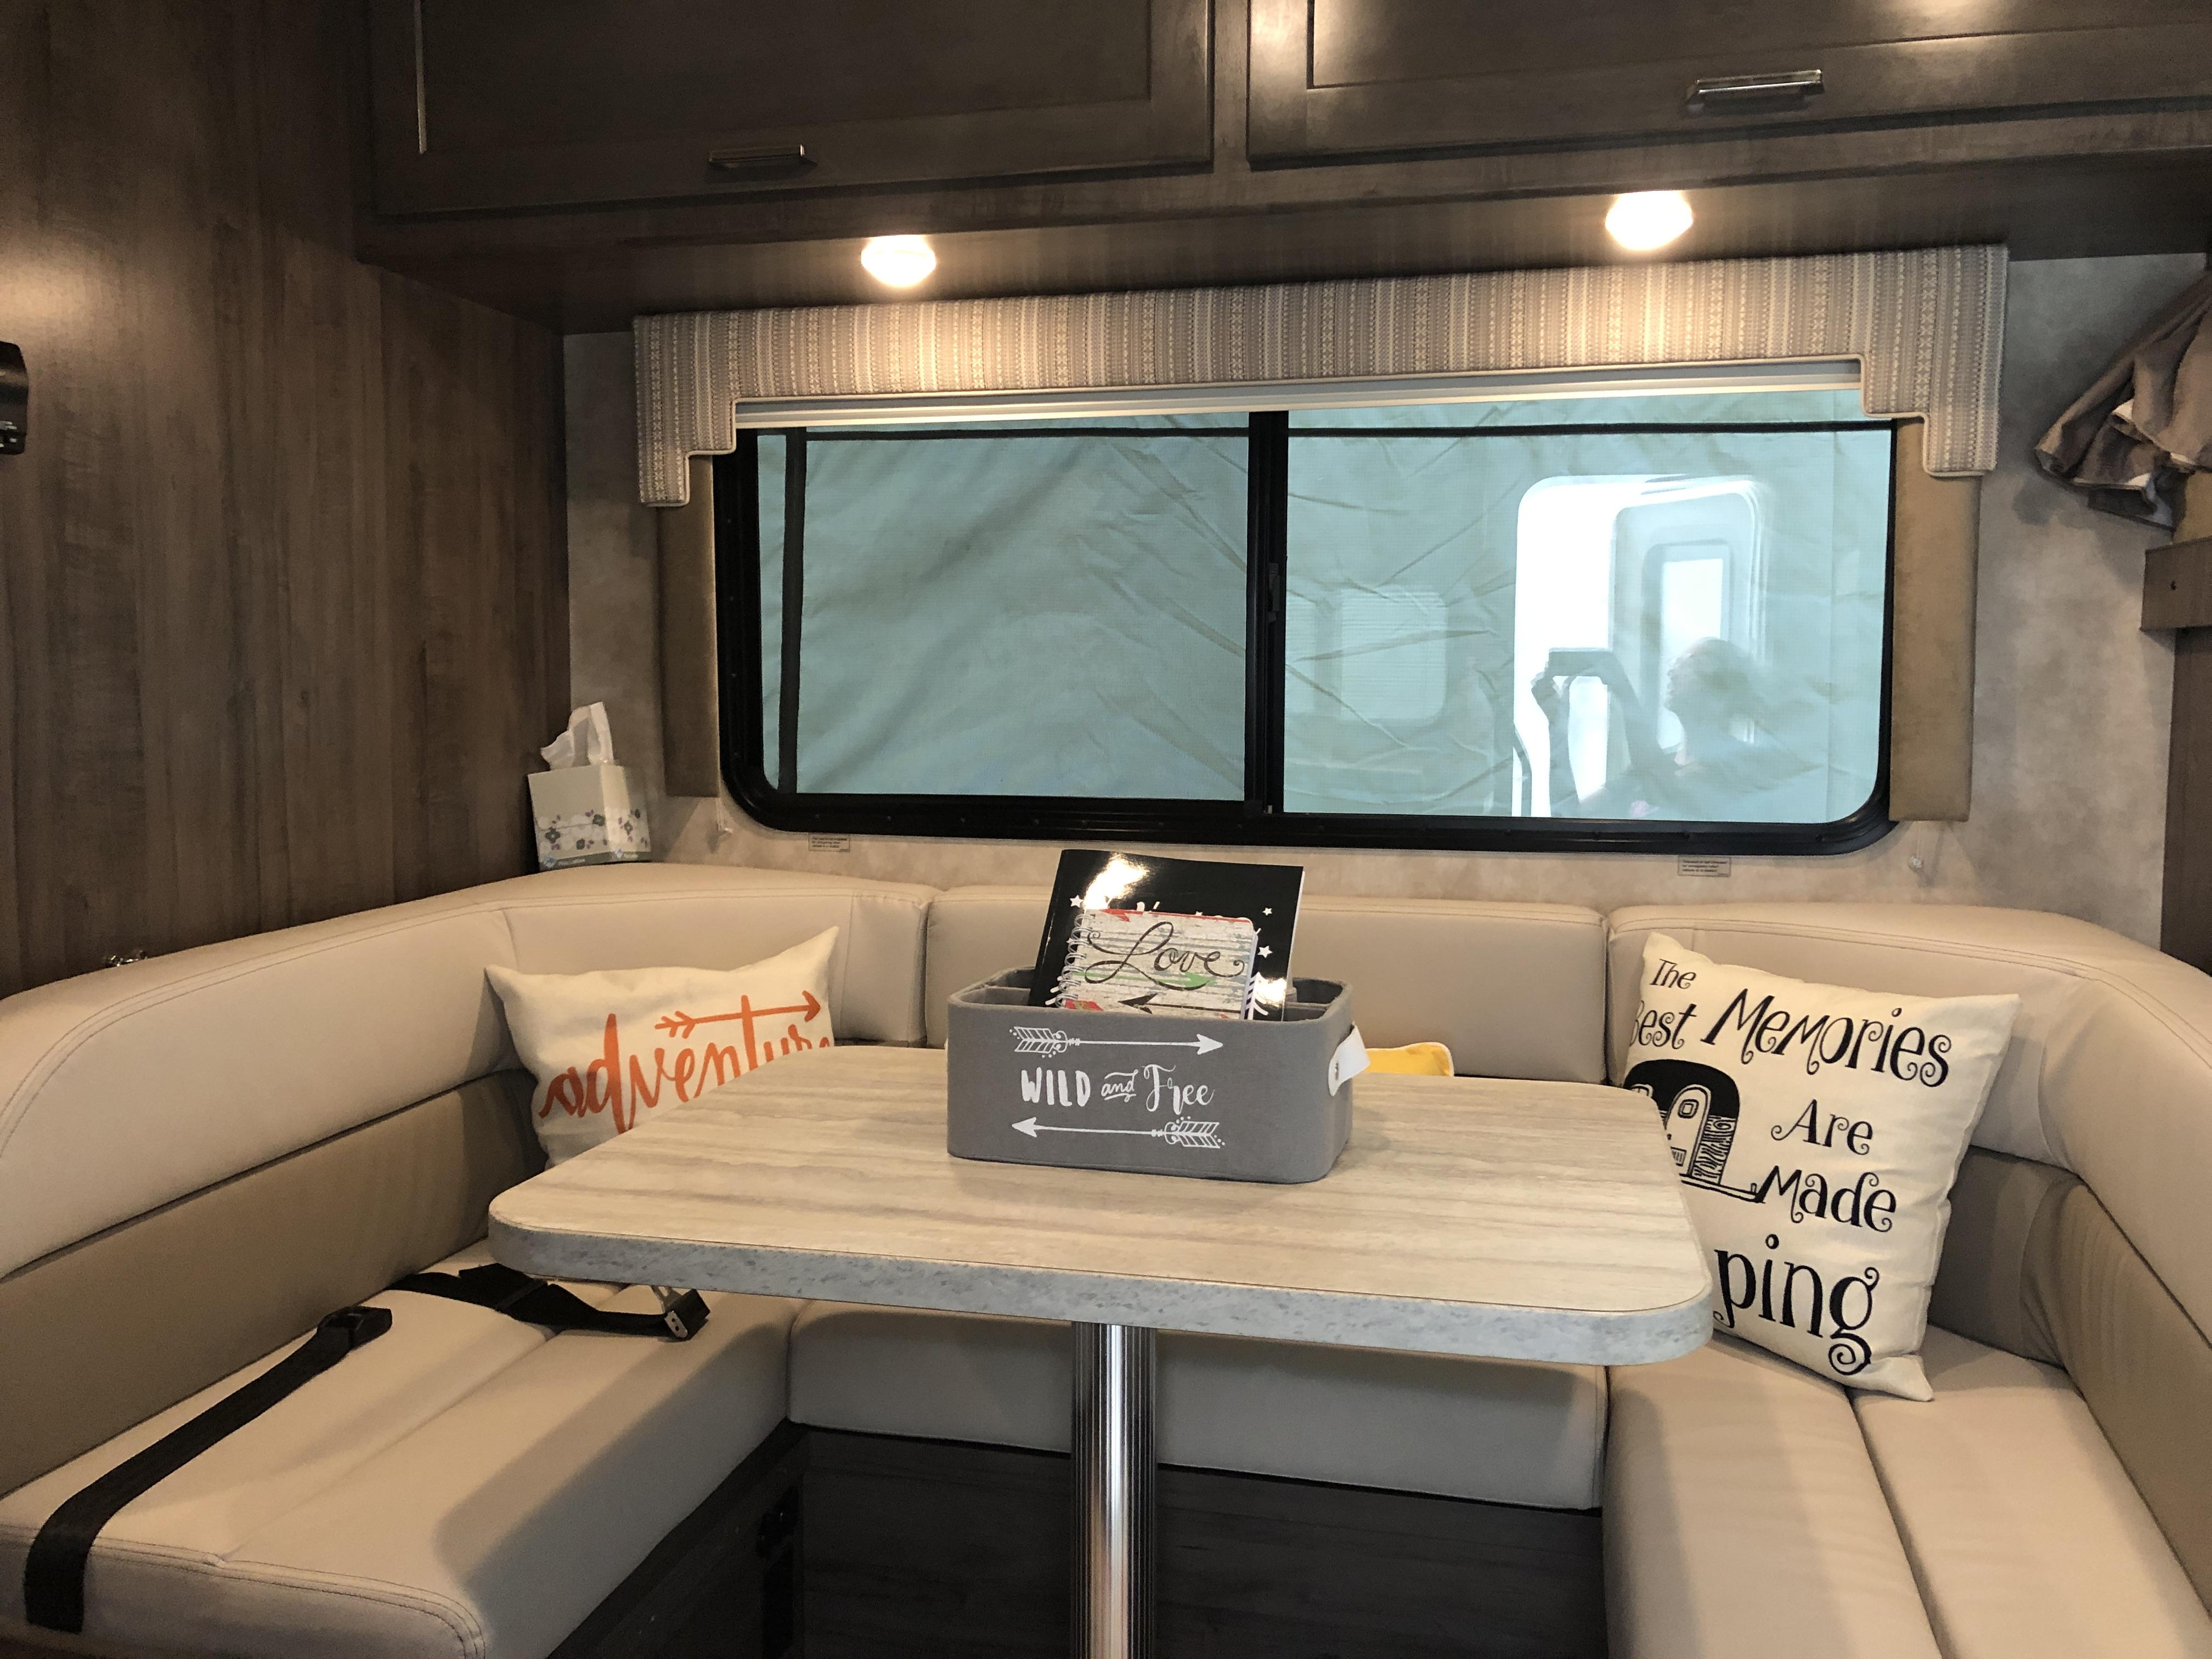 Food storage up above. Seatbelts for added safety when the RV is en route.. Winnebago Minnie Winnie 2018